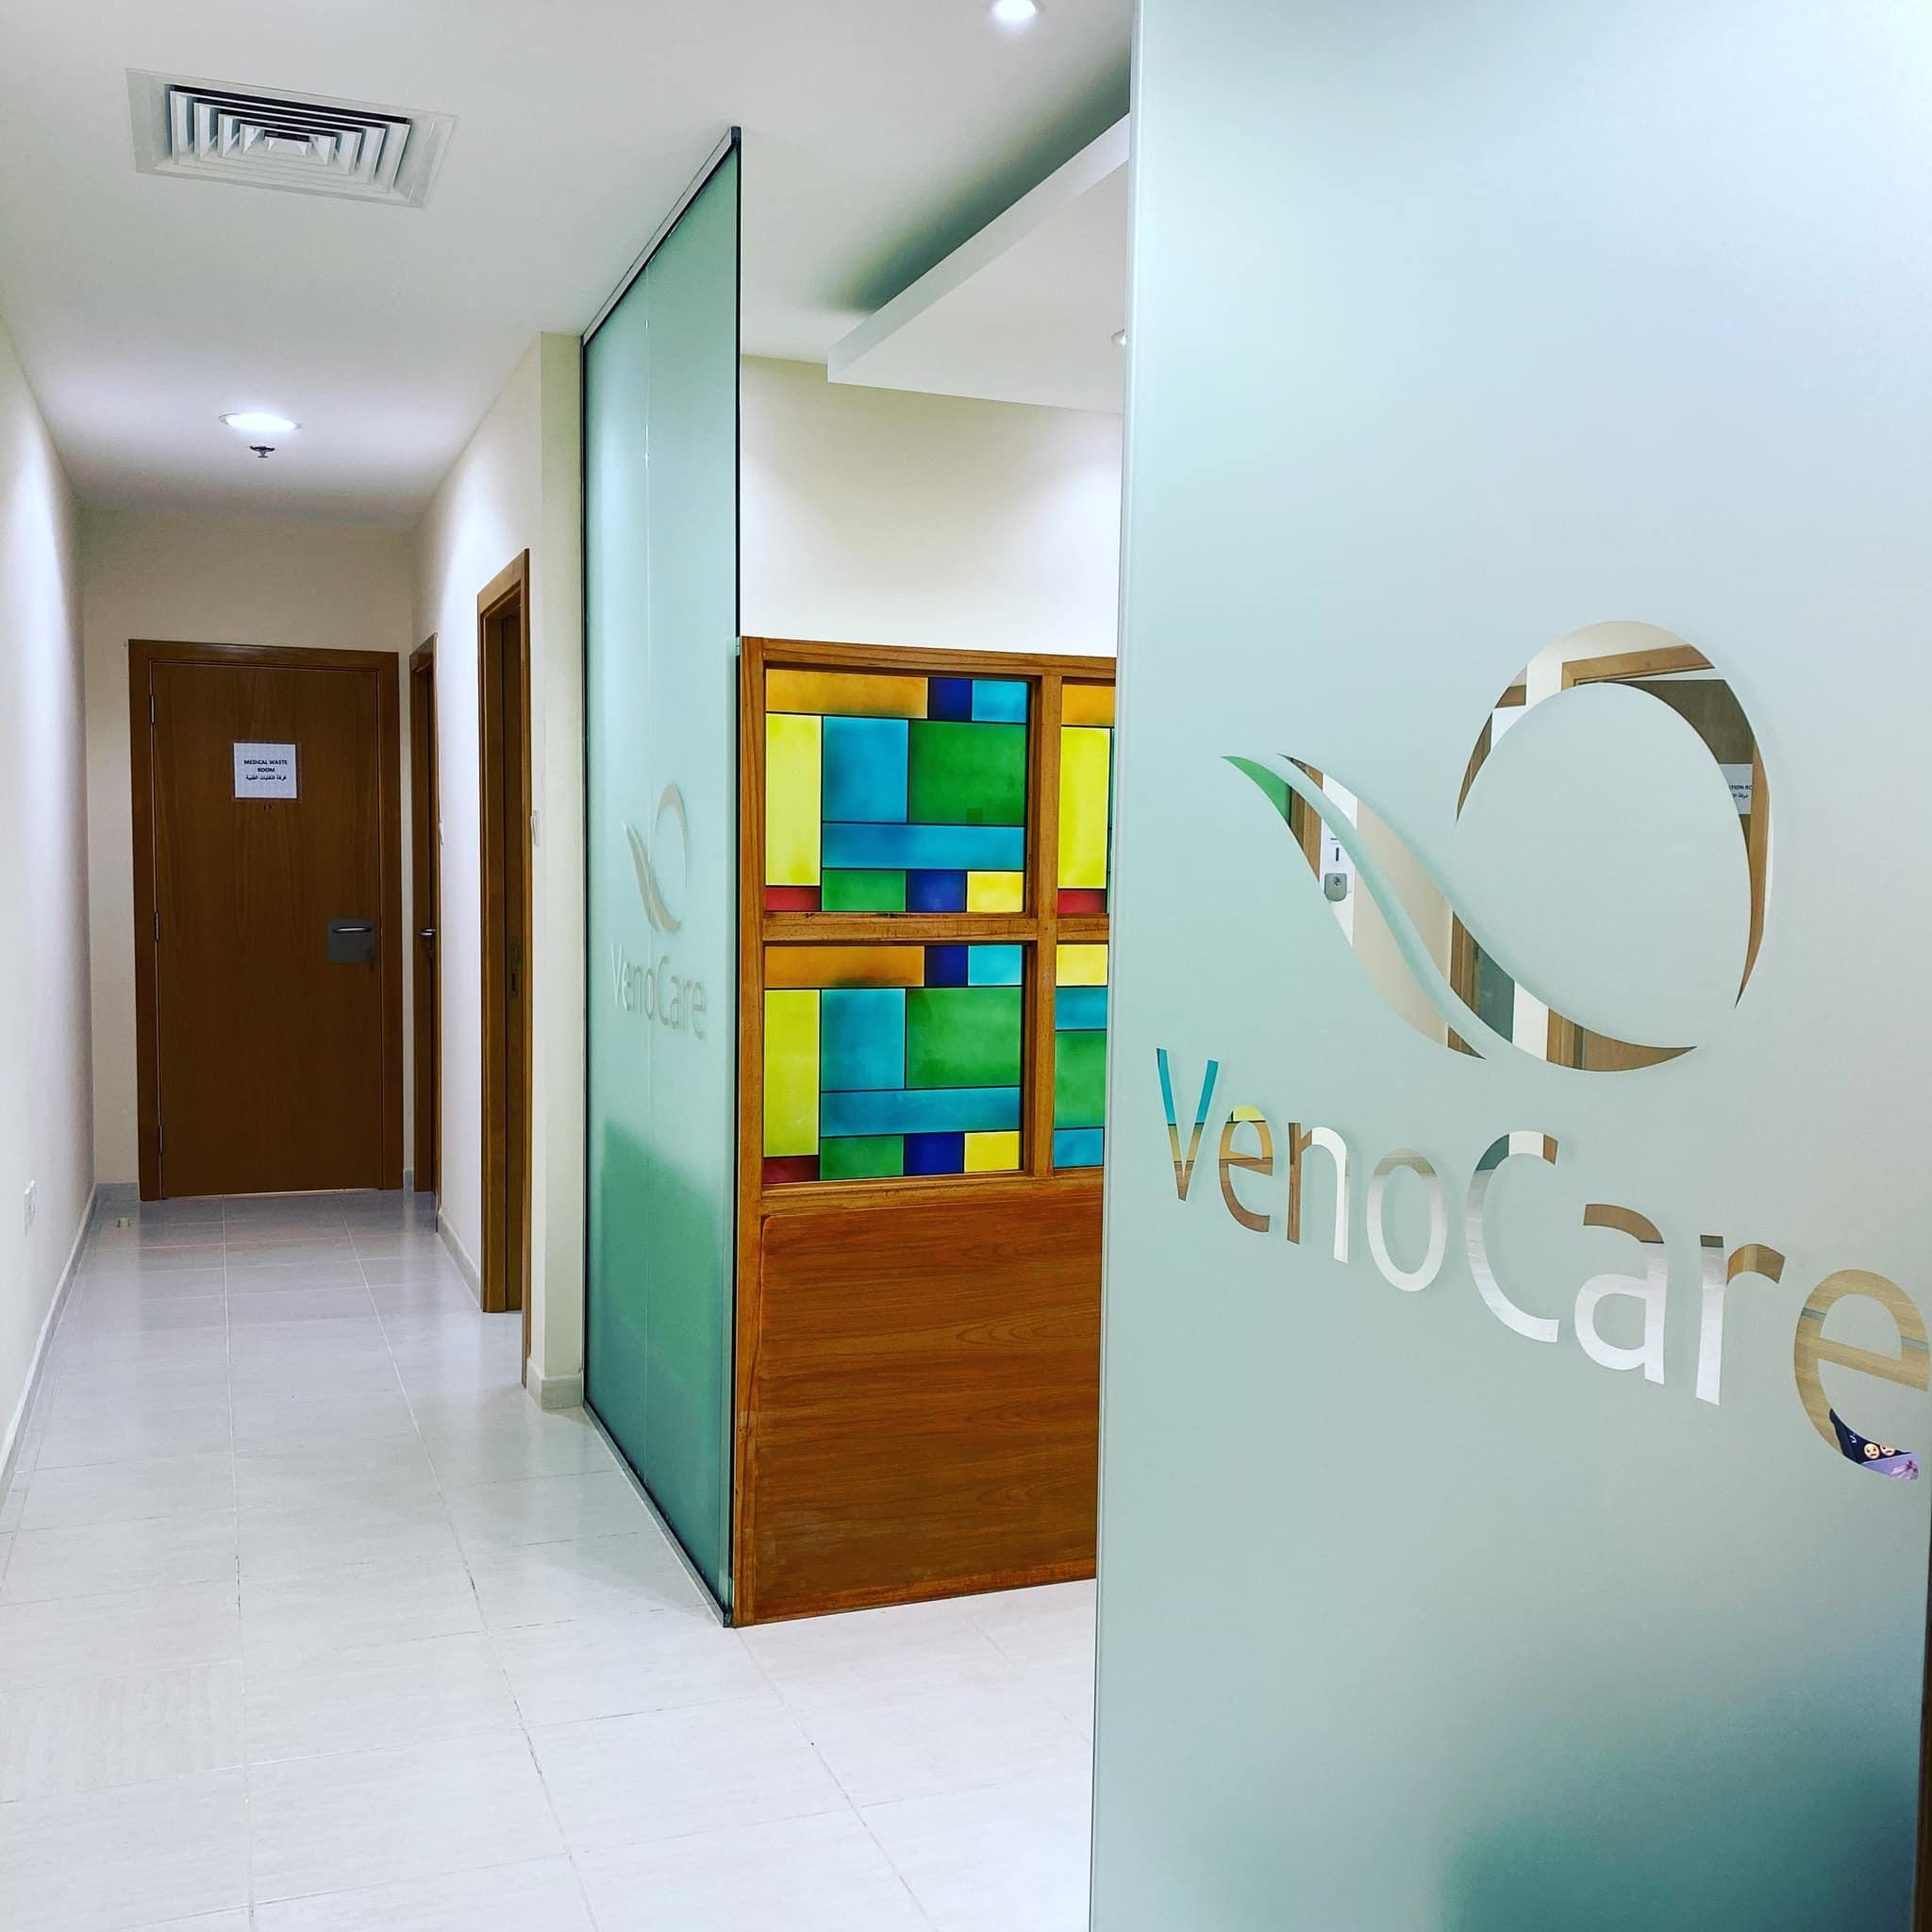 veins treatment clinic.jpg